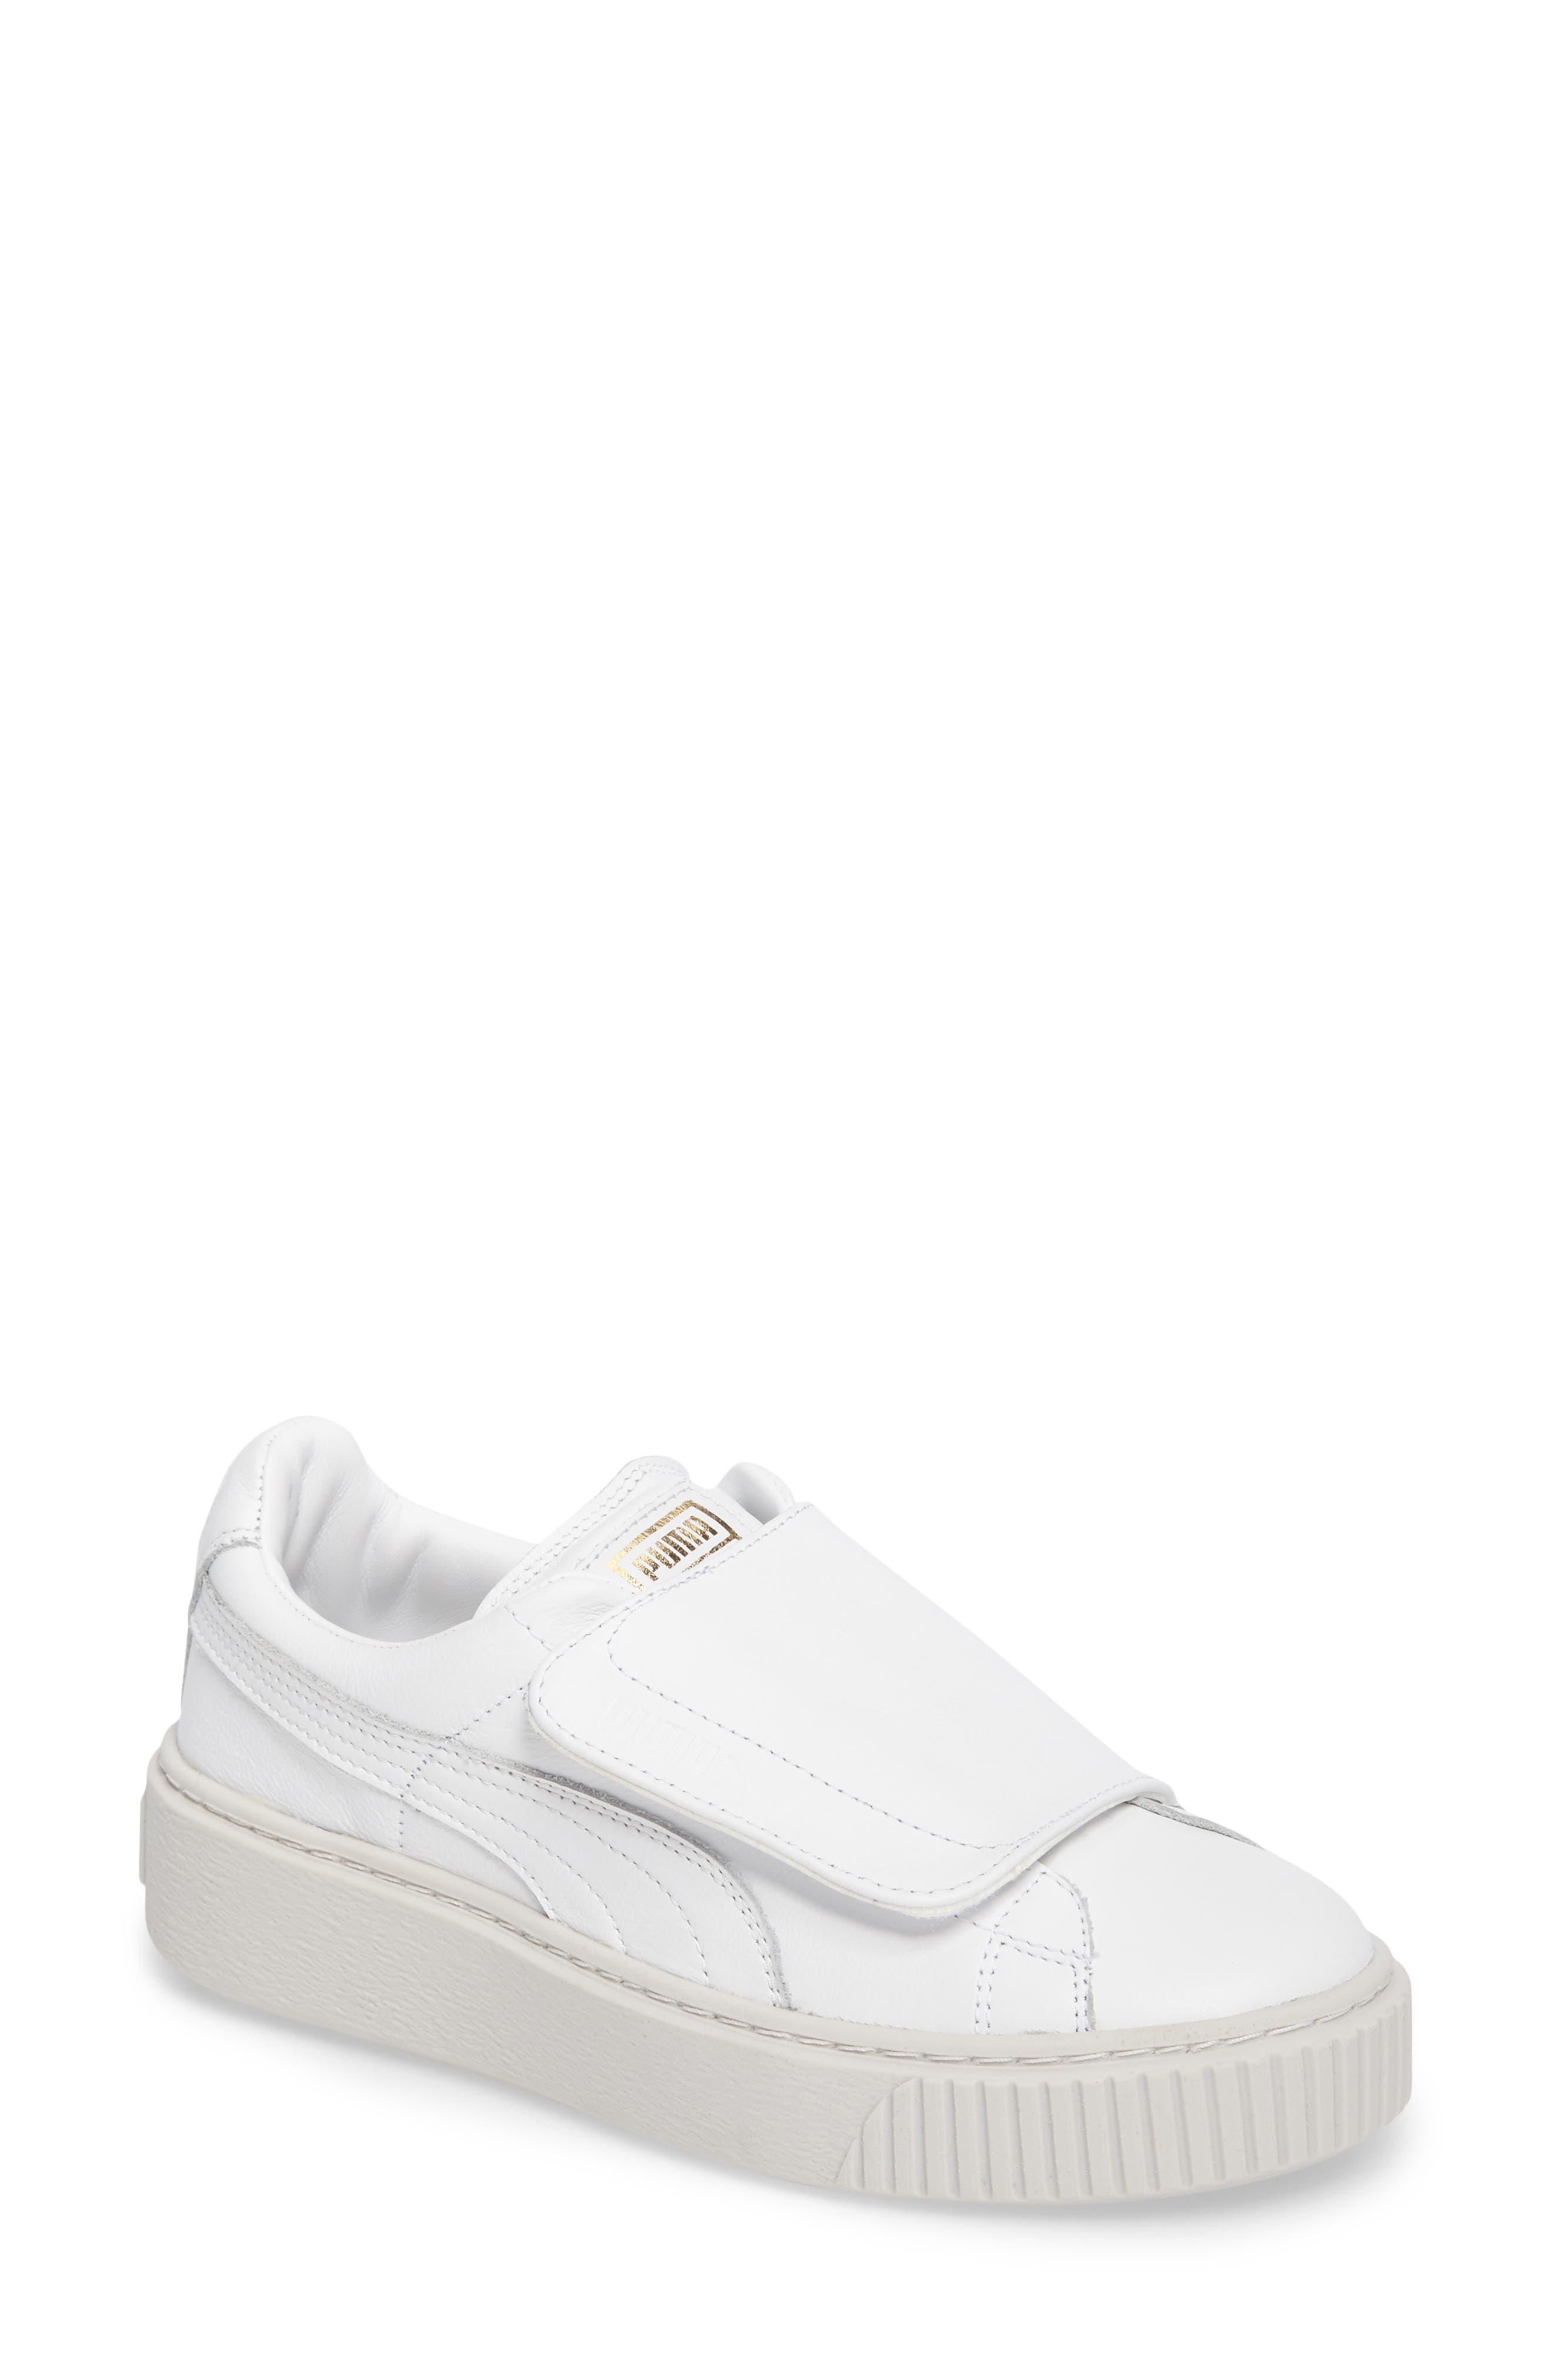 PUMA Basket Platform Sneaker (Women)